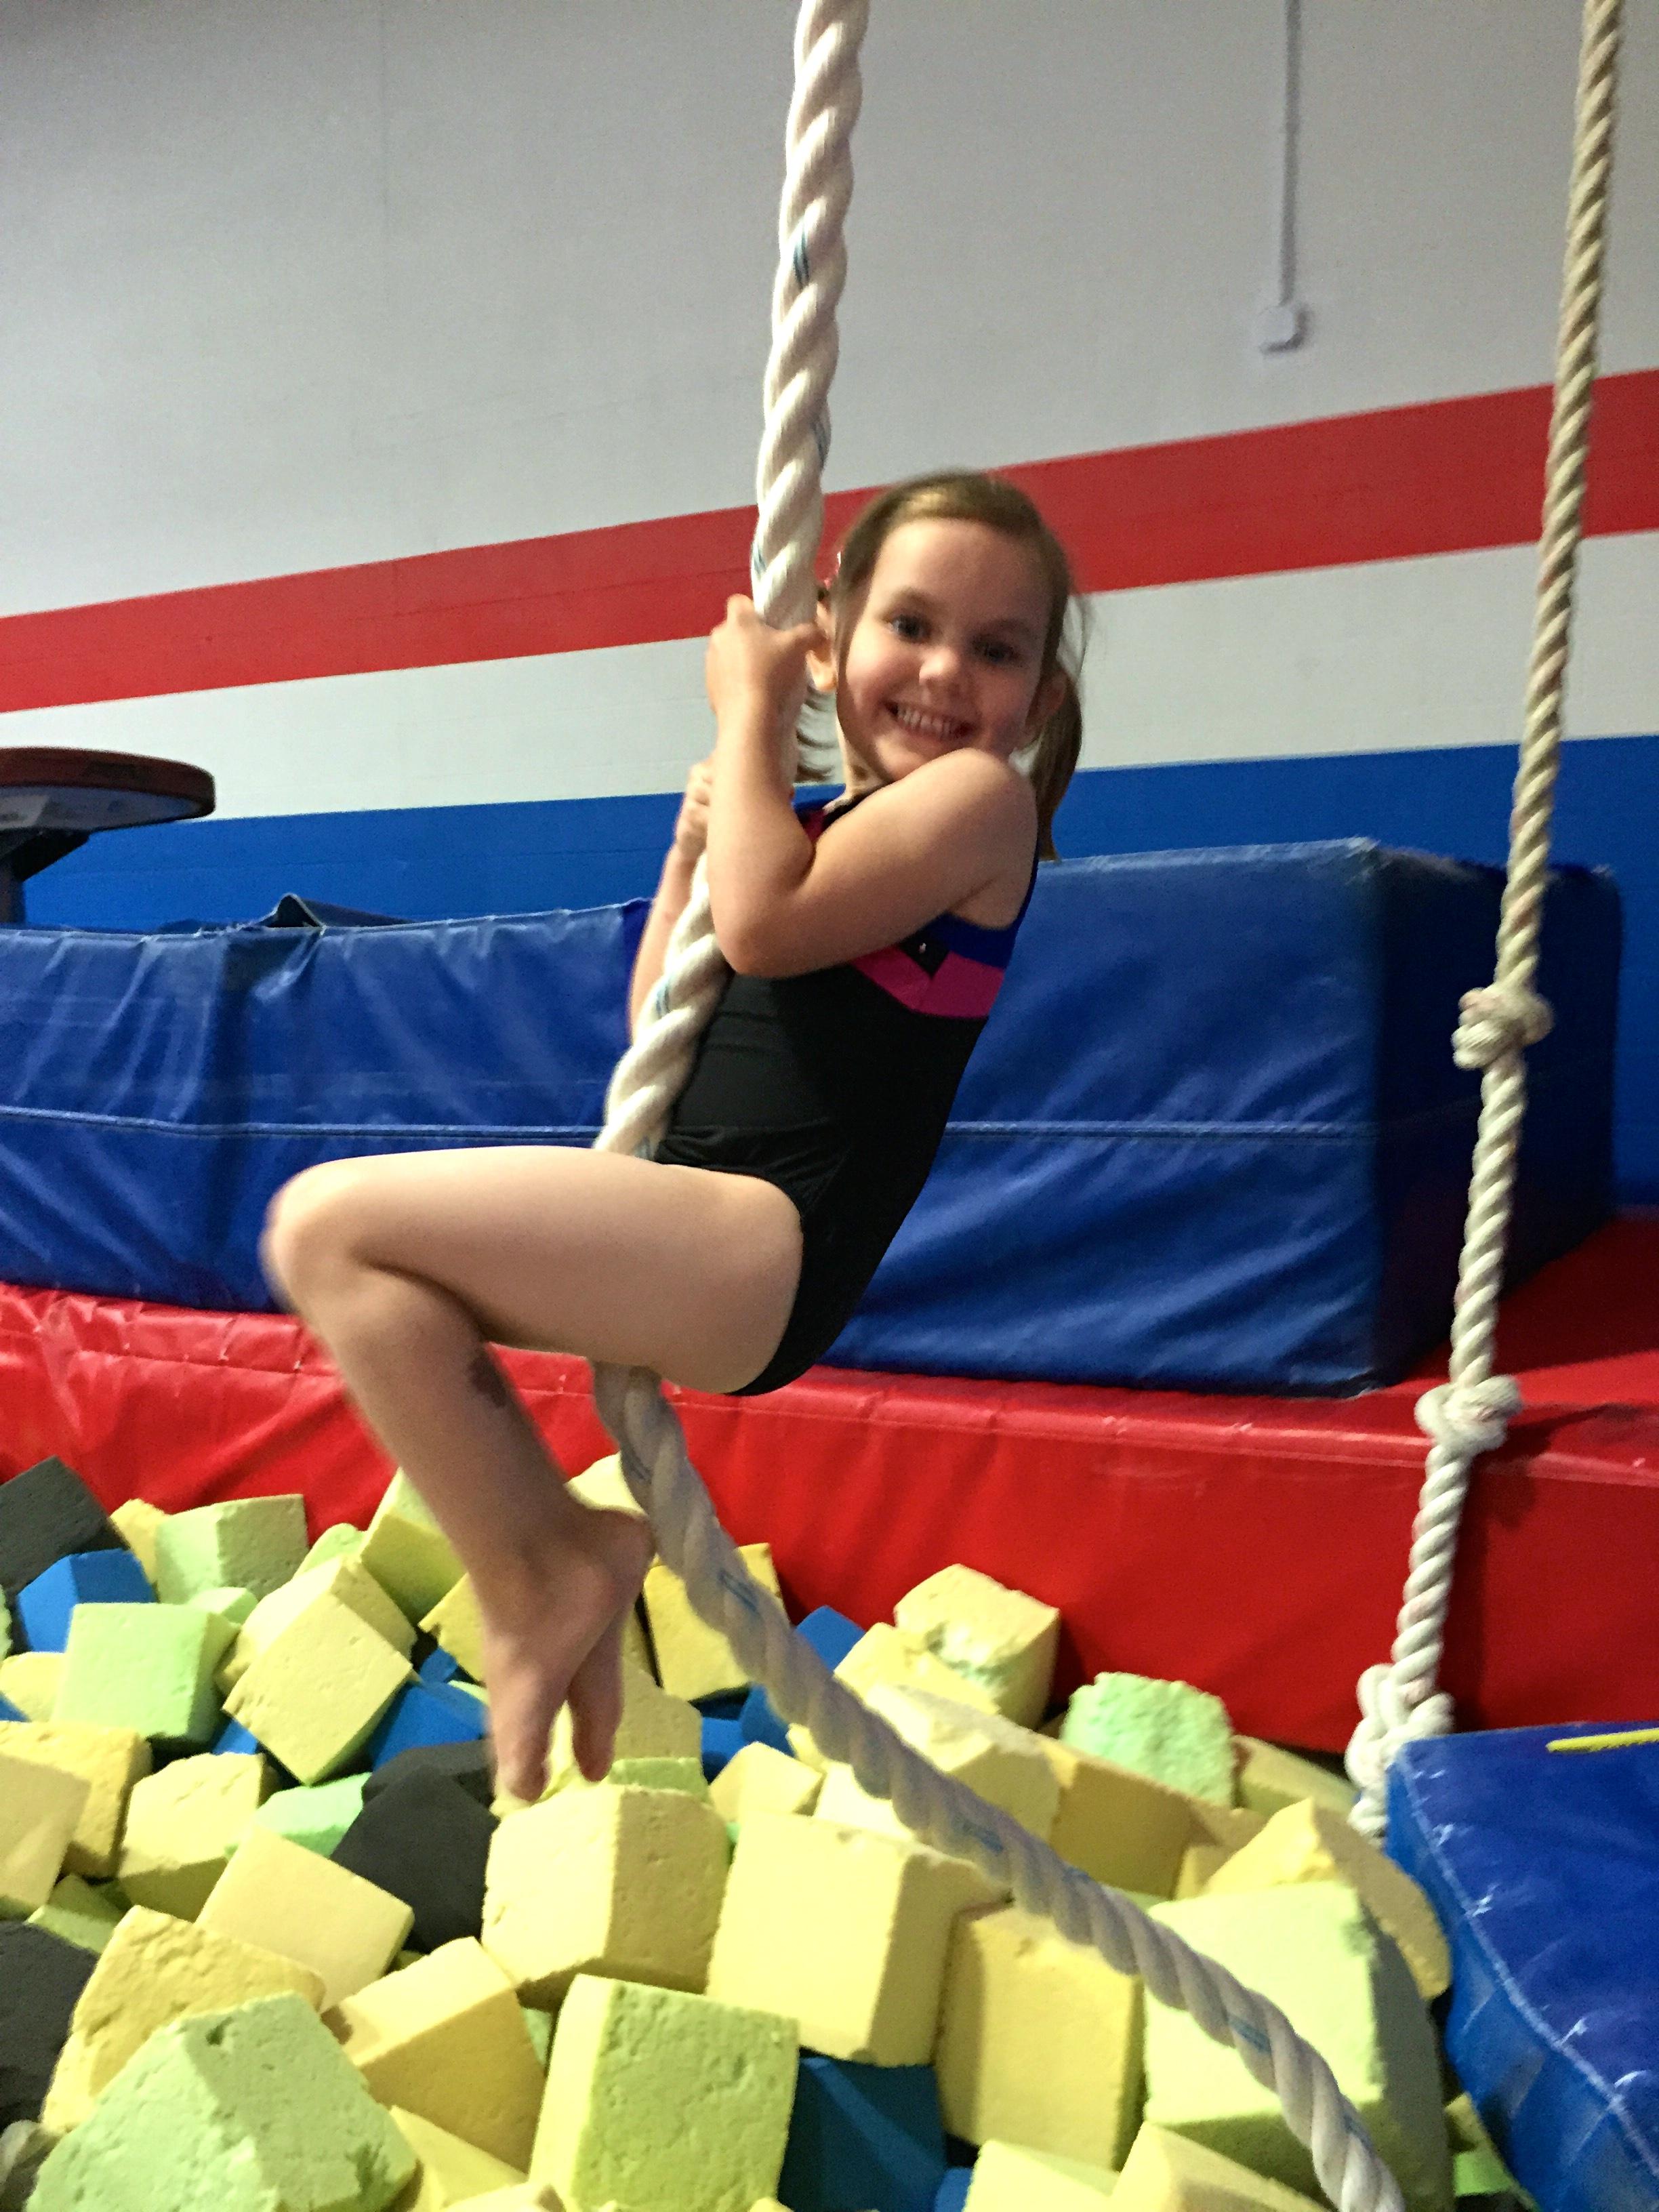 Flips Gymnast Rope Climb